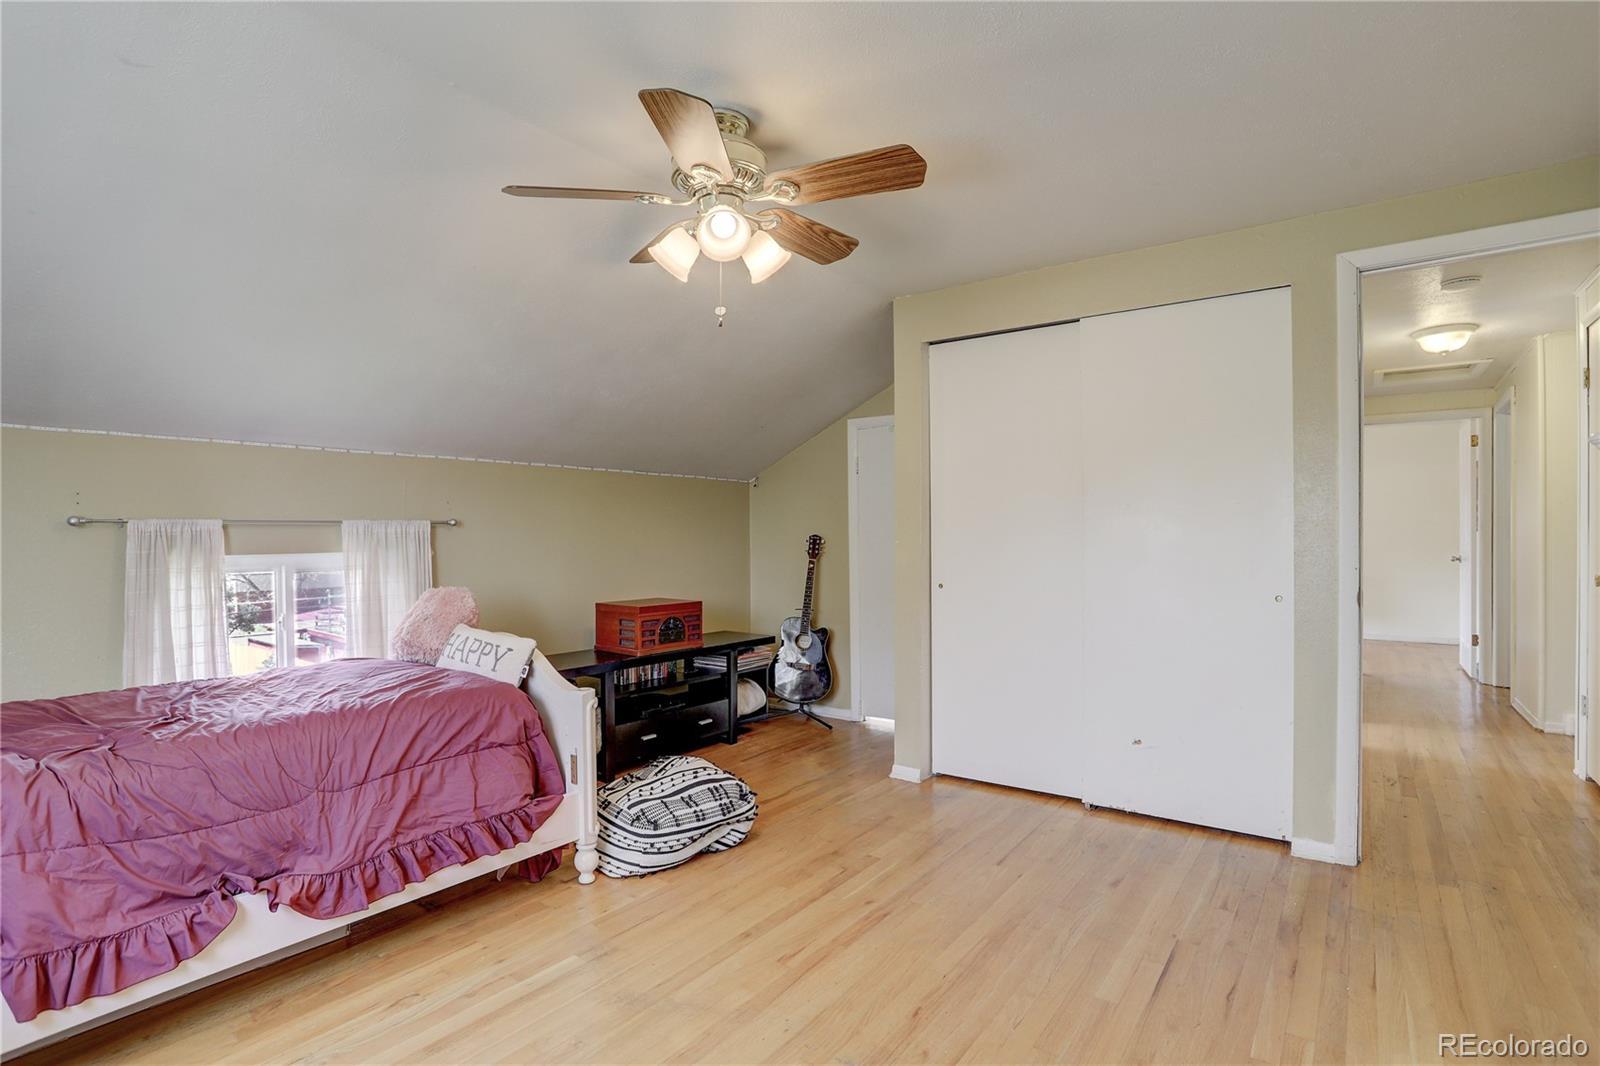 MLS# 1853069 - 20 - 820 W 6th Avenue, Broomfield, CO 80020